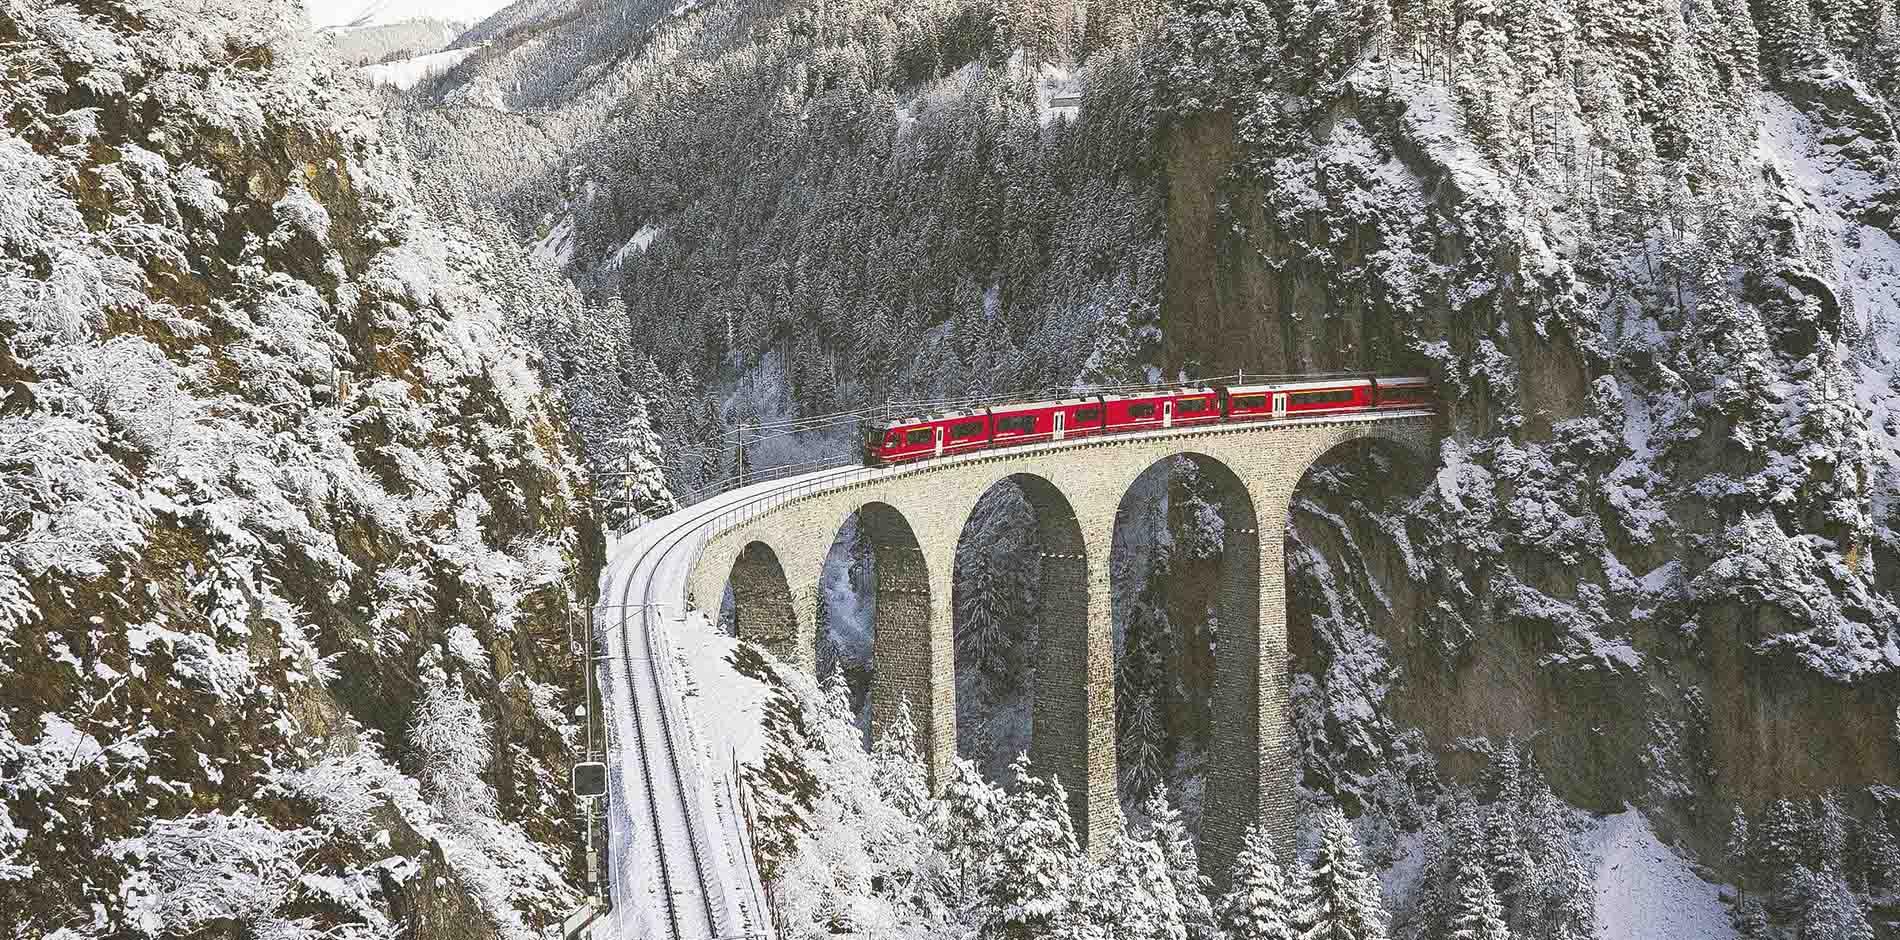 garnica_contrachapado_fireshield_train_6